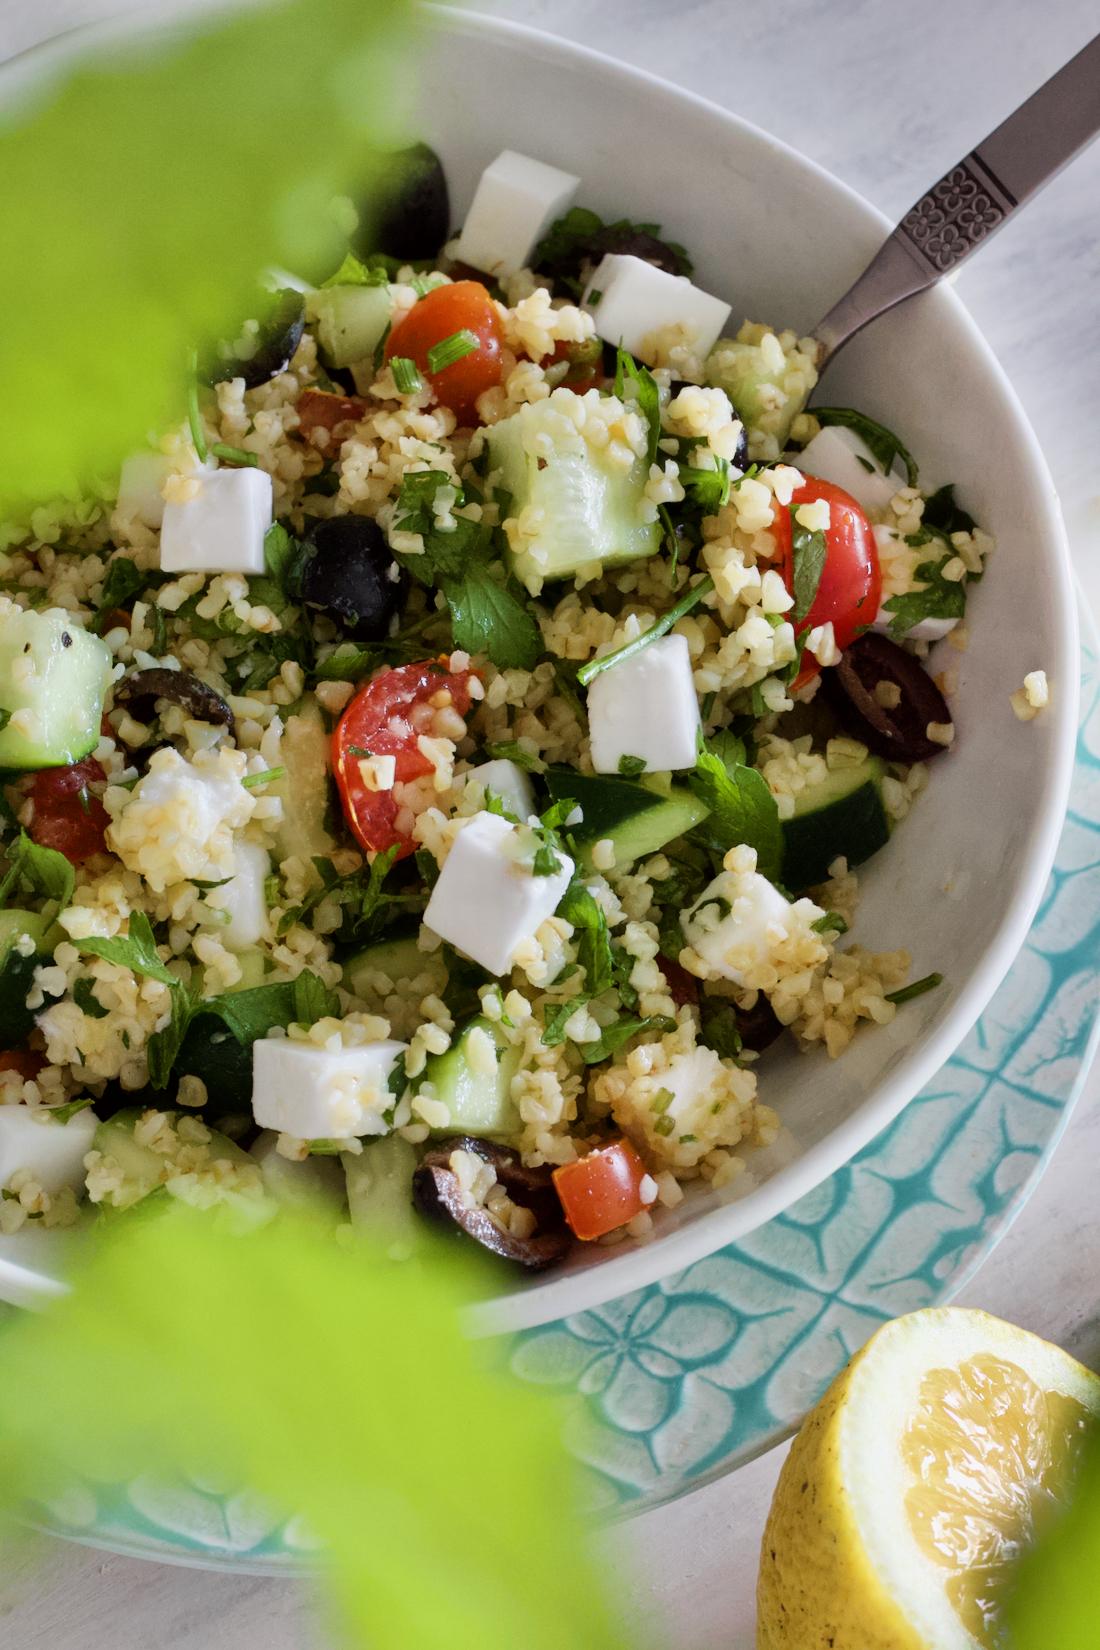 bulgur-feta-olives-salad-salada-azeitonas-mediterrânica-4